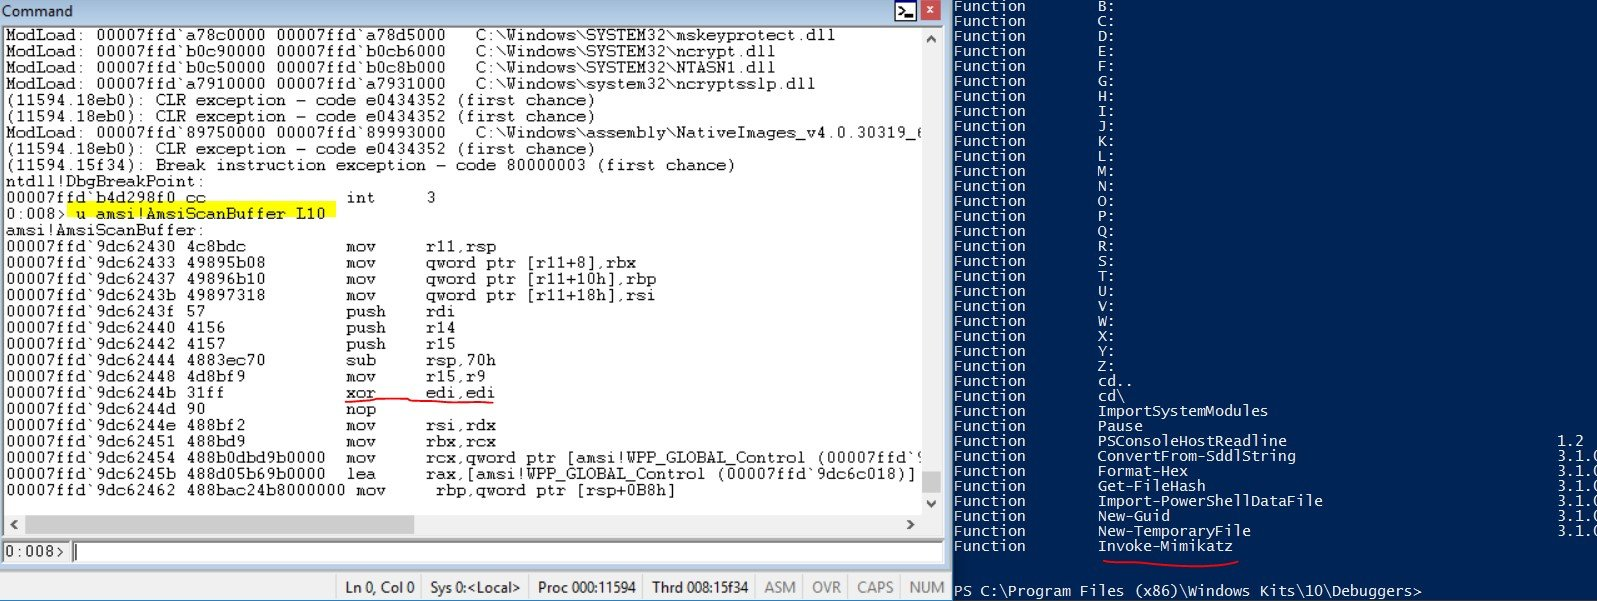 AMSI Bypass Redux   CyberArk